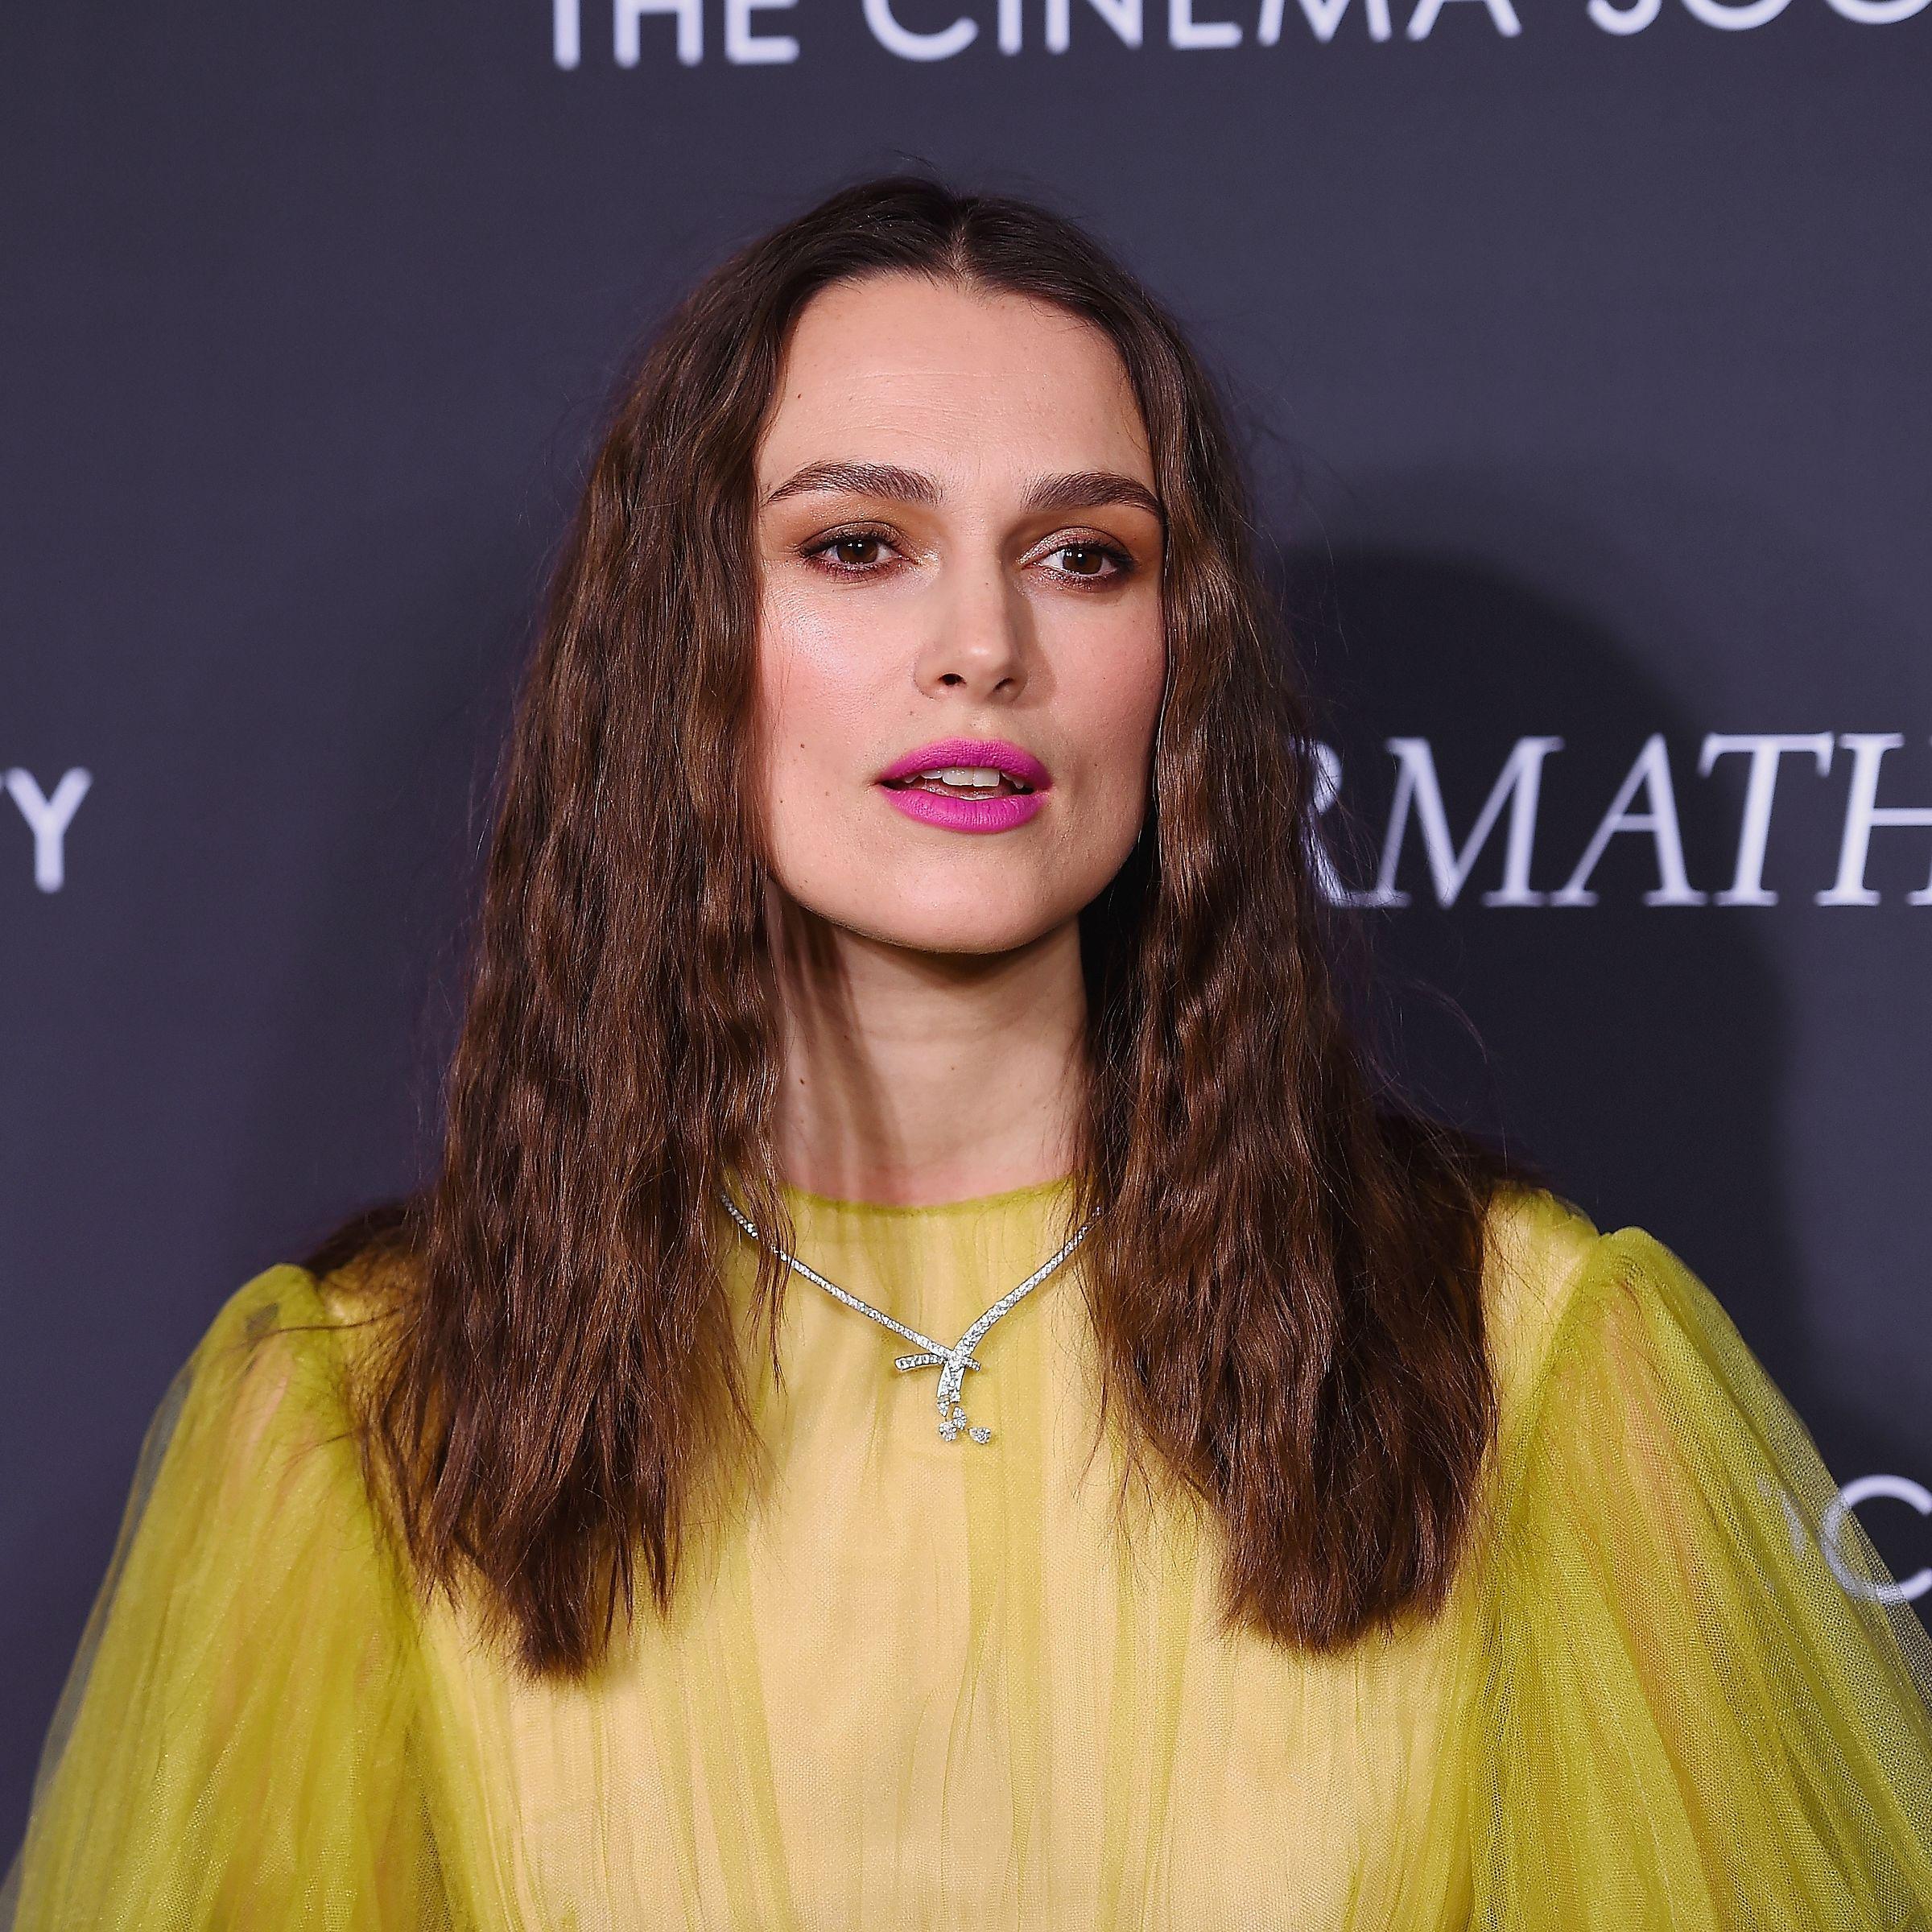 celebrity acne struggles - women's health uk